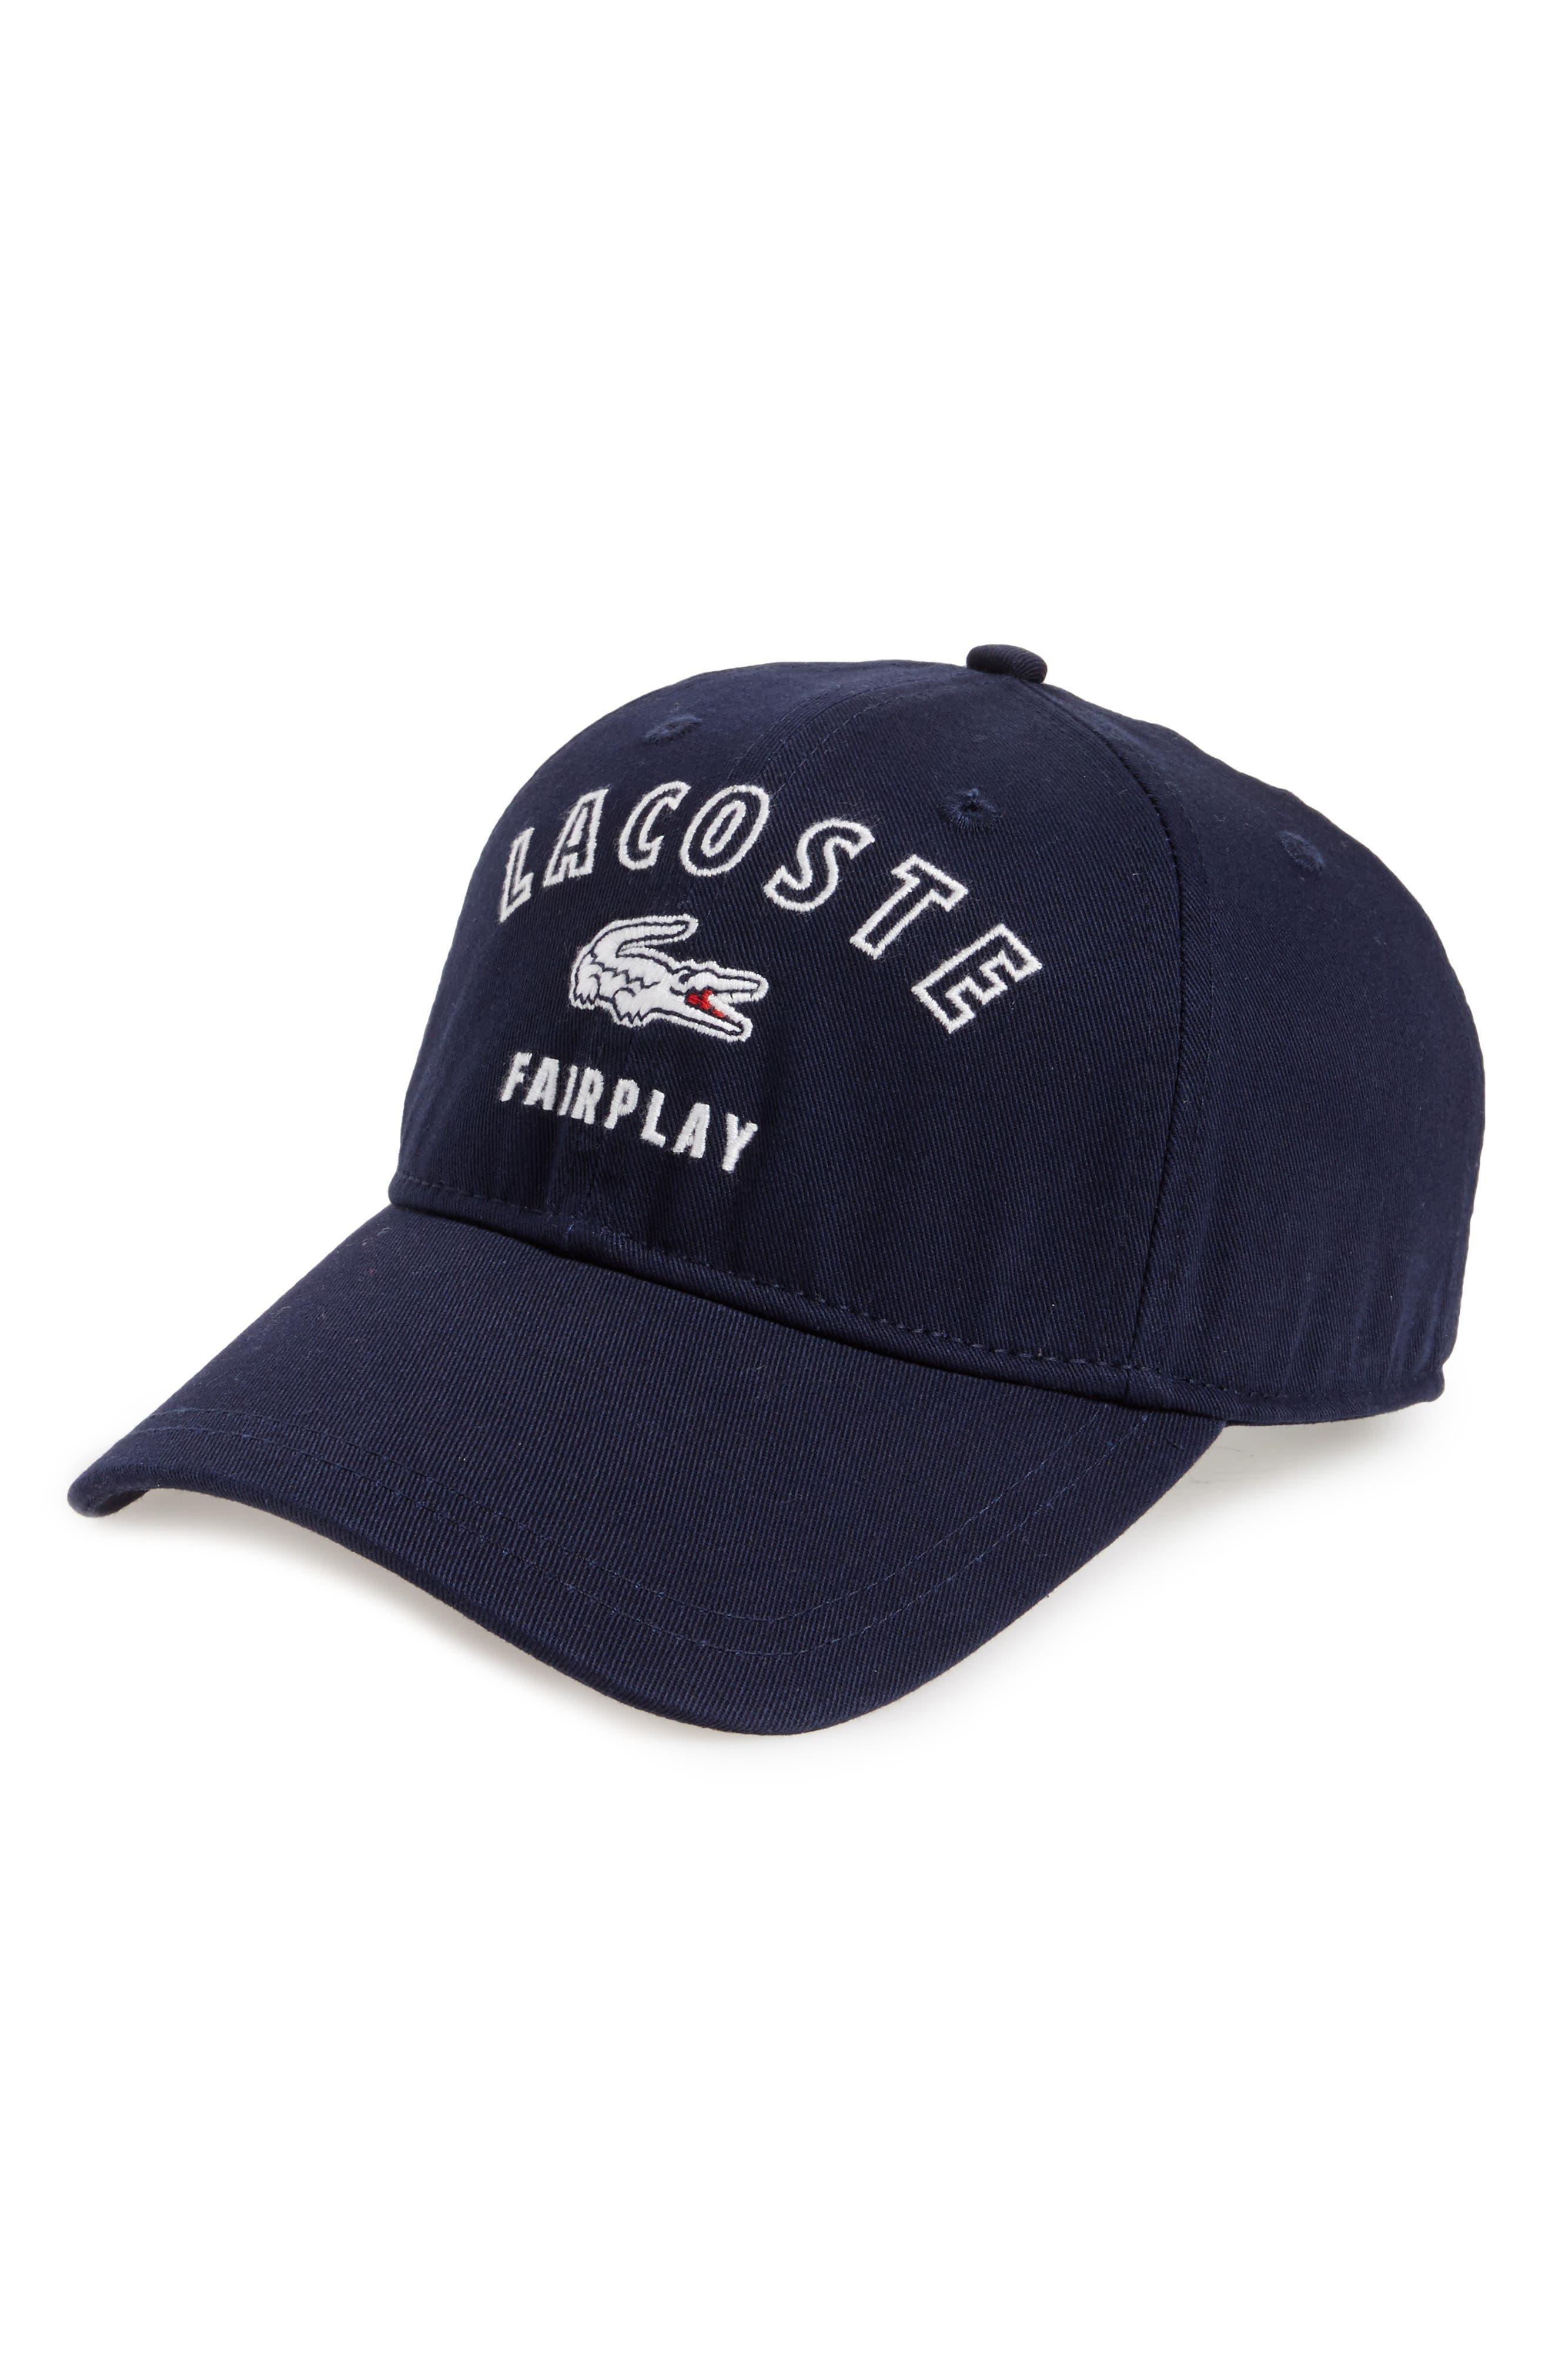 Main Image - Lacoste Fairplay Gabardine Ball Cap